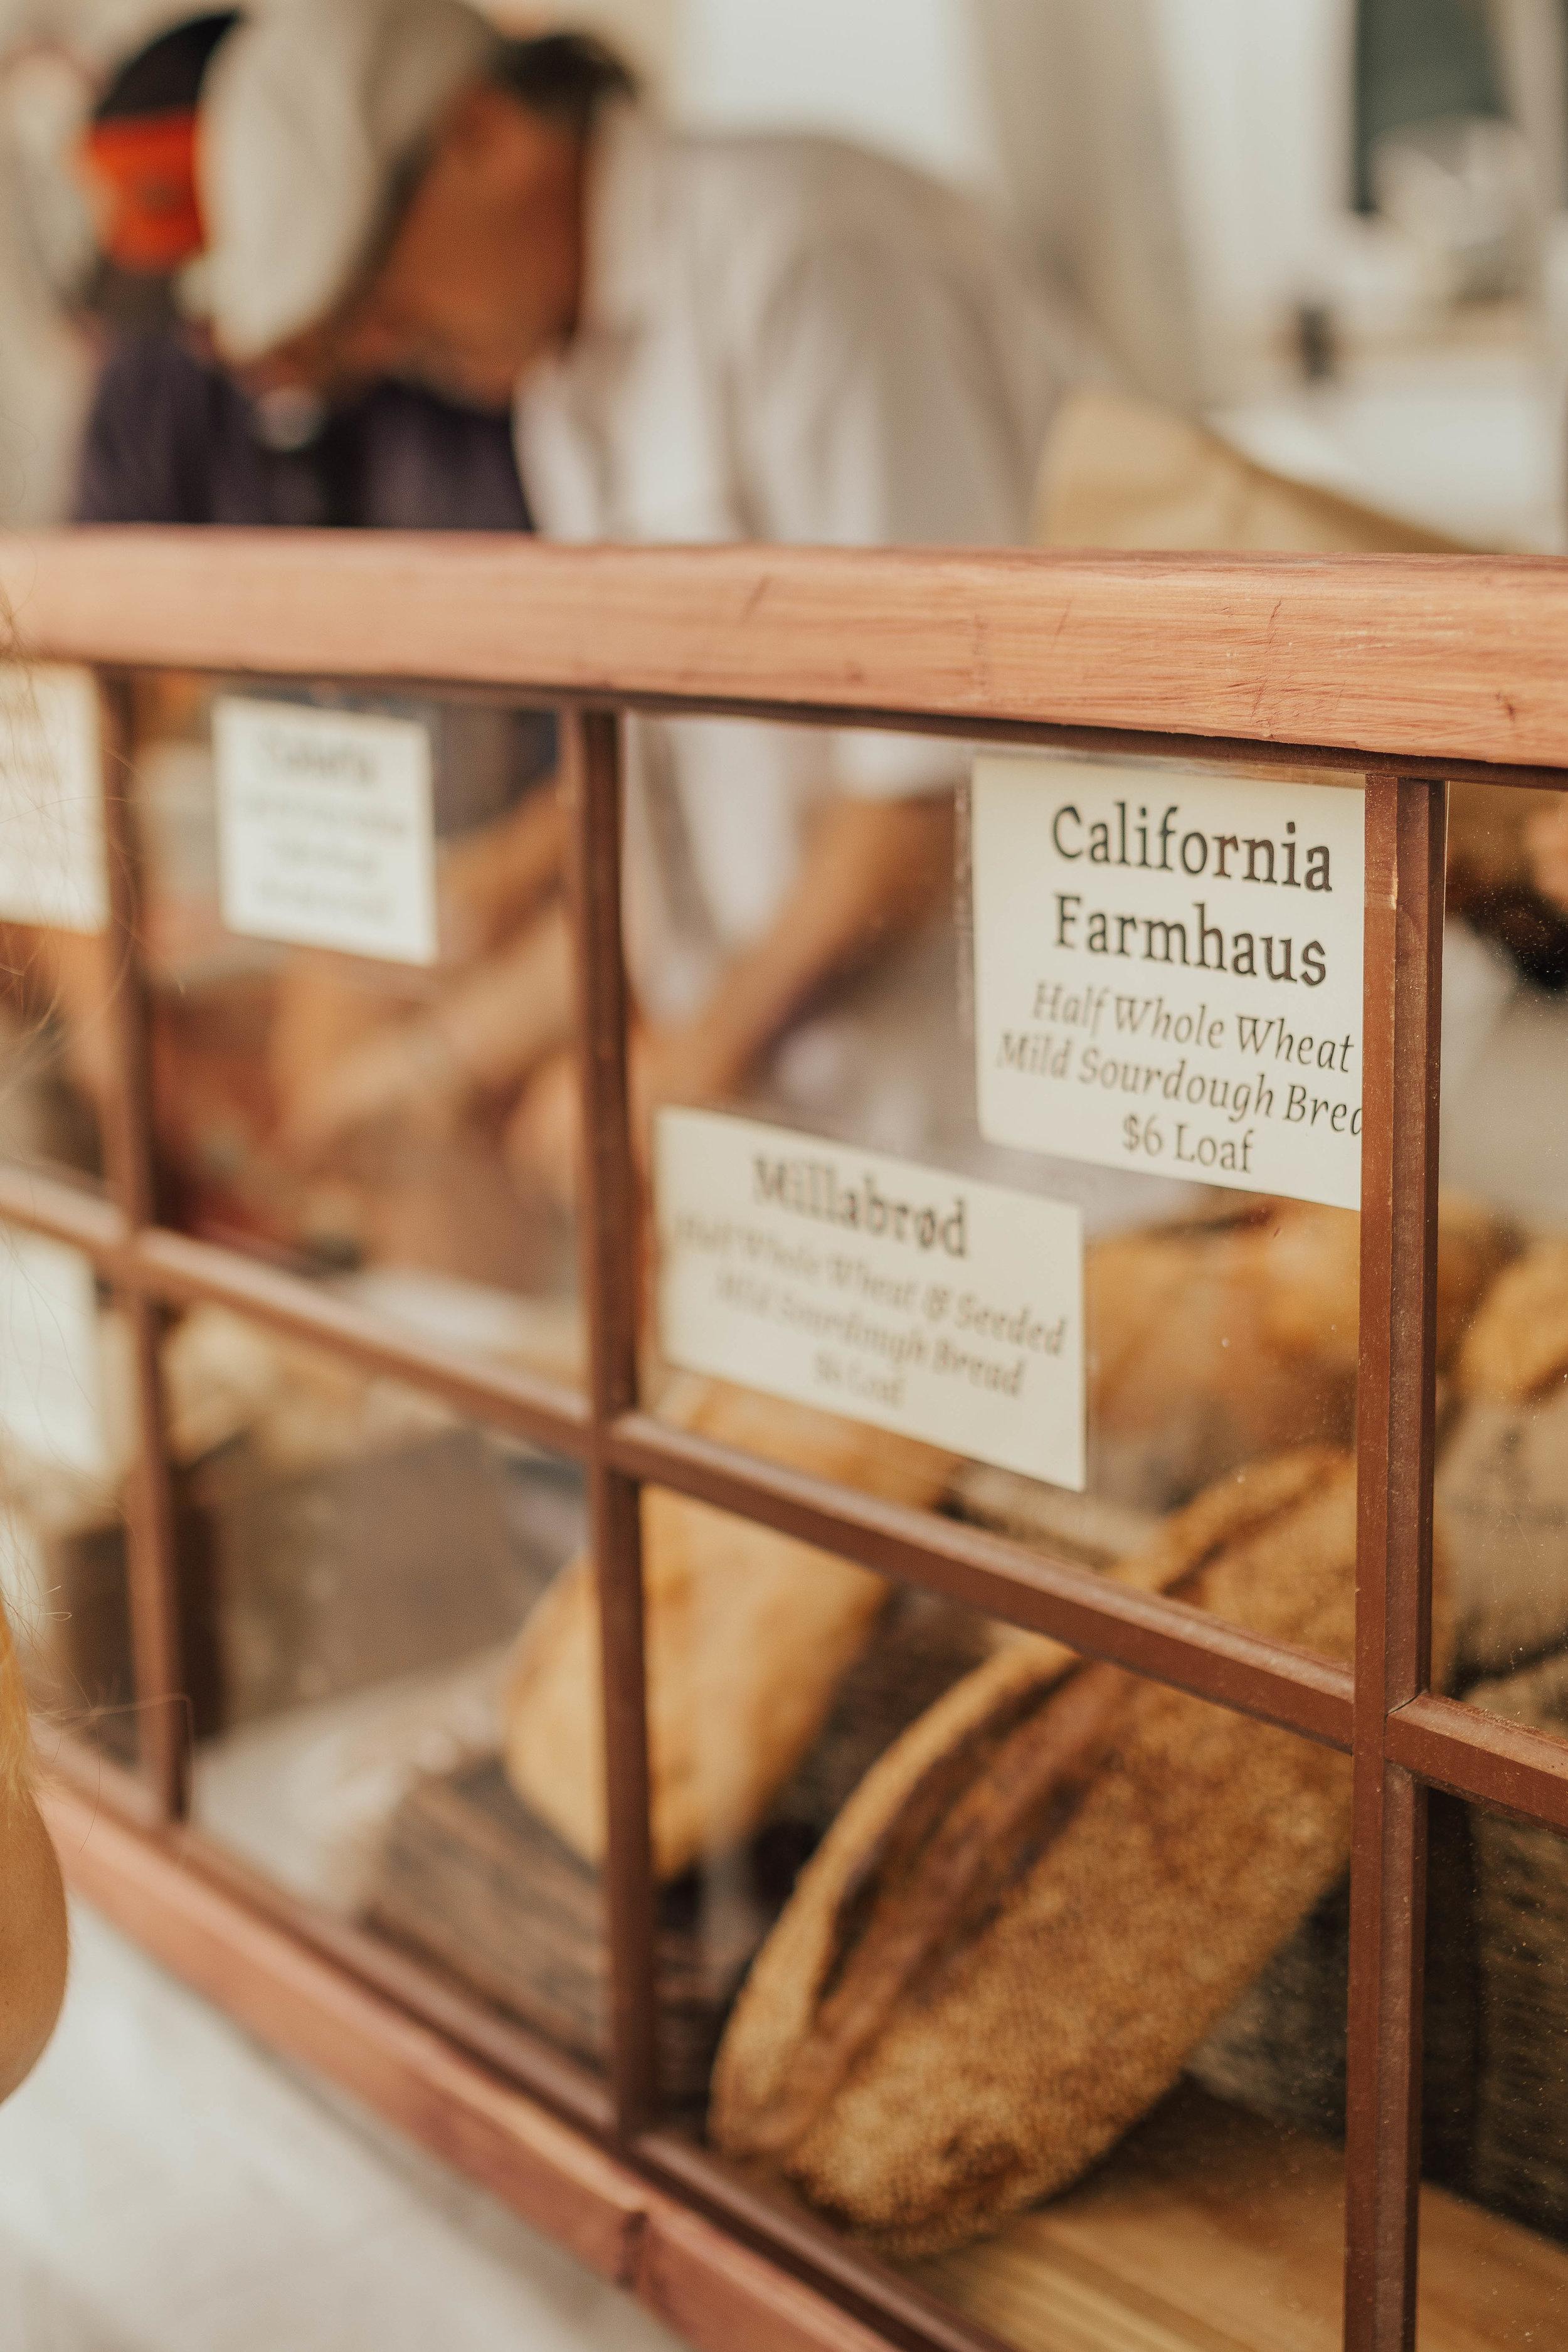 millabrod bread